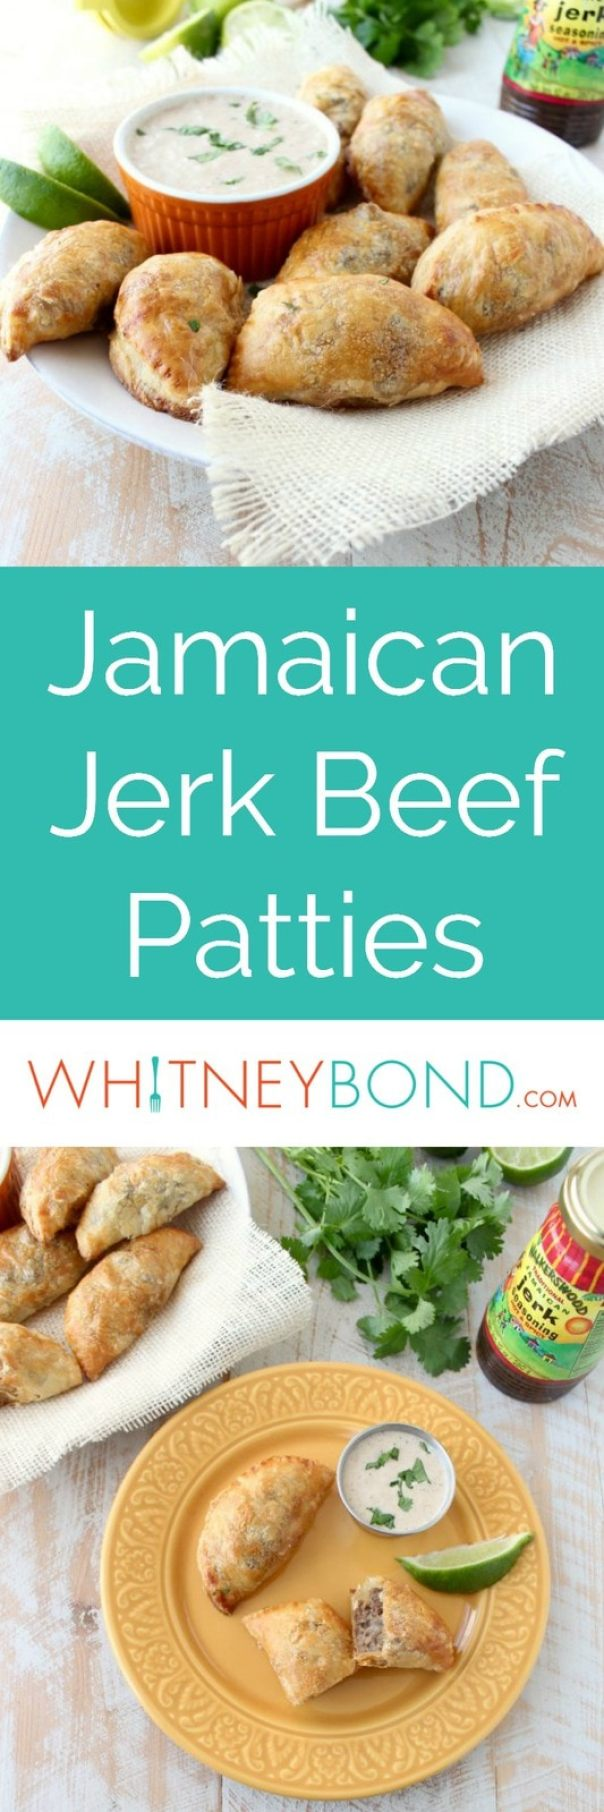 Jamaican Jerk Beef Patties Recipe - WhitneyBond.com